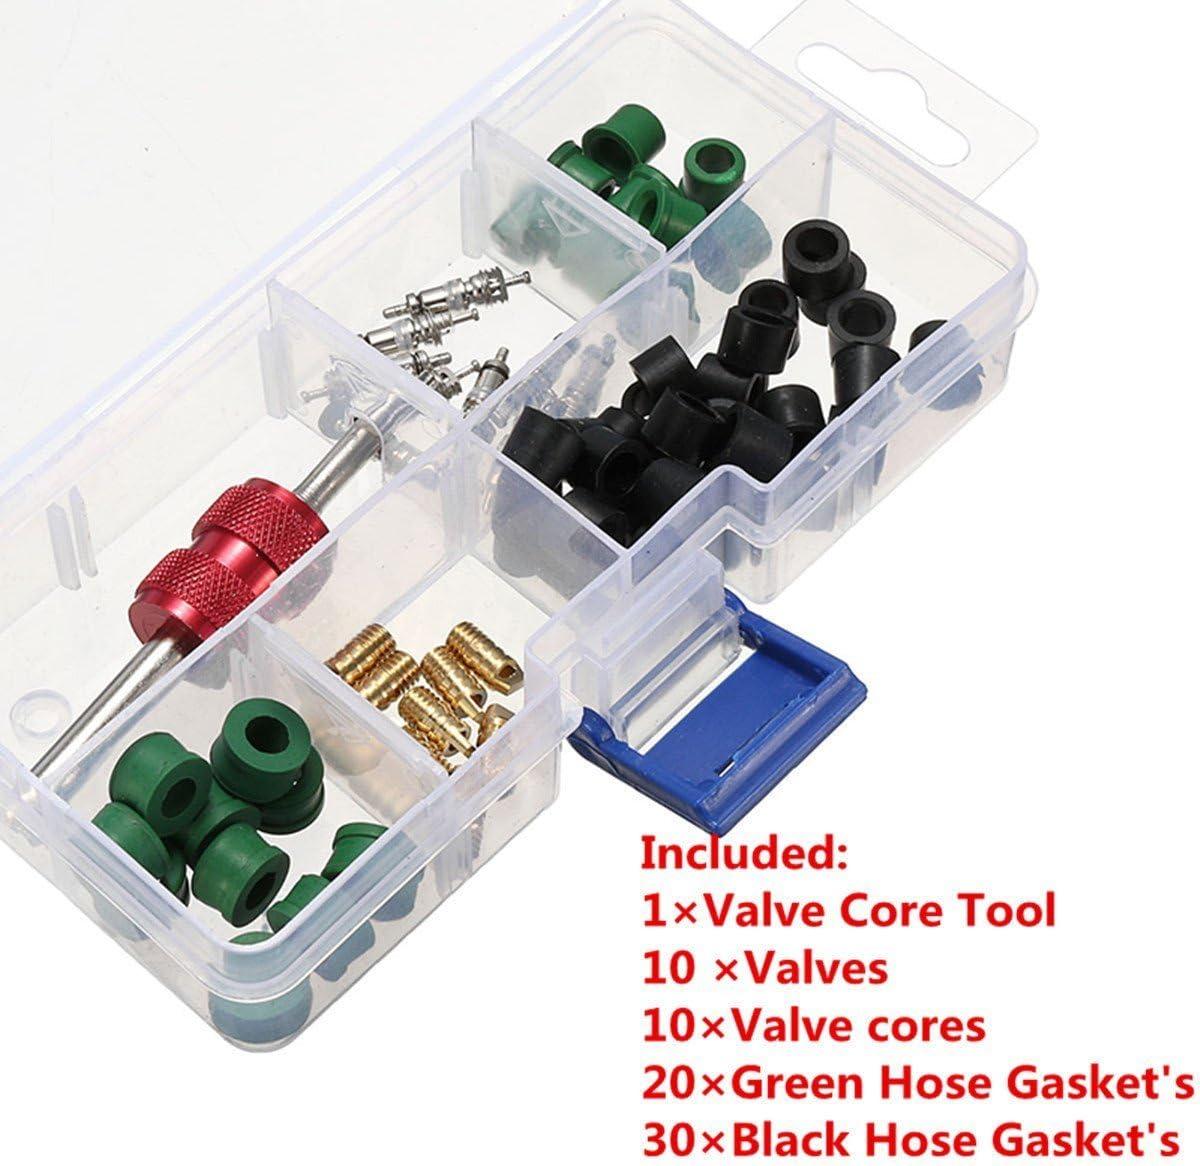 71 Pcs Air Conditioning Valve Core A//C Repair Tool,10Pcs Value Cores+50Pcs Hose Gaskets+10Pcs Values